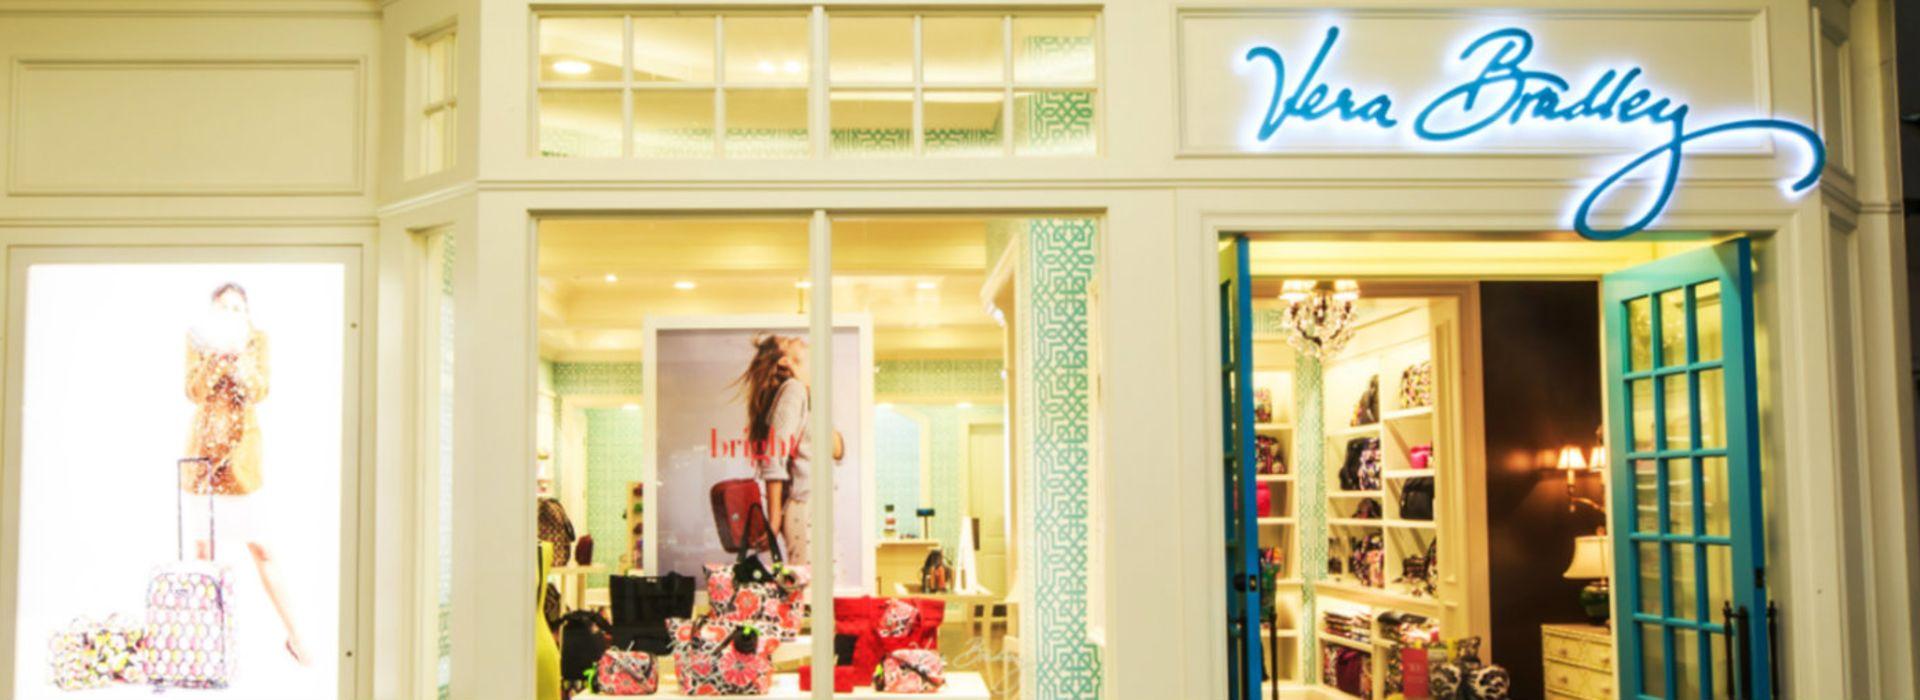 Lakeside Shopping Center